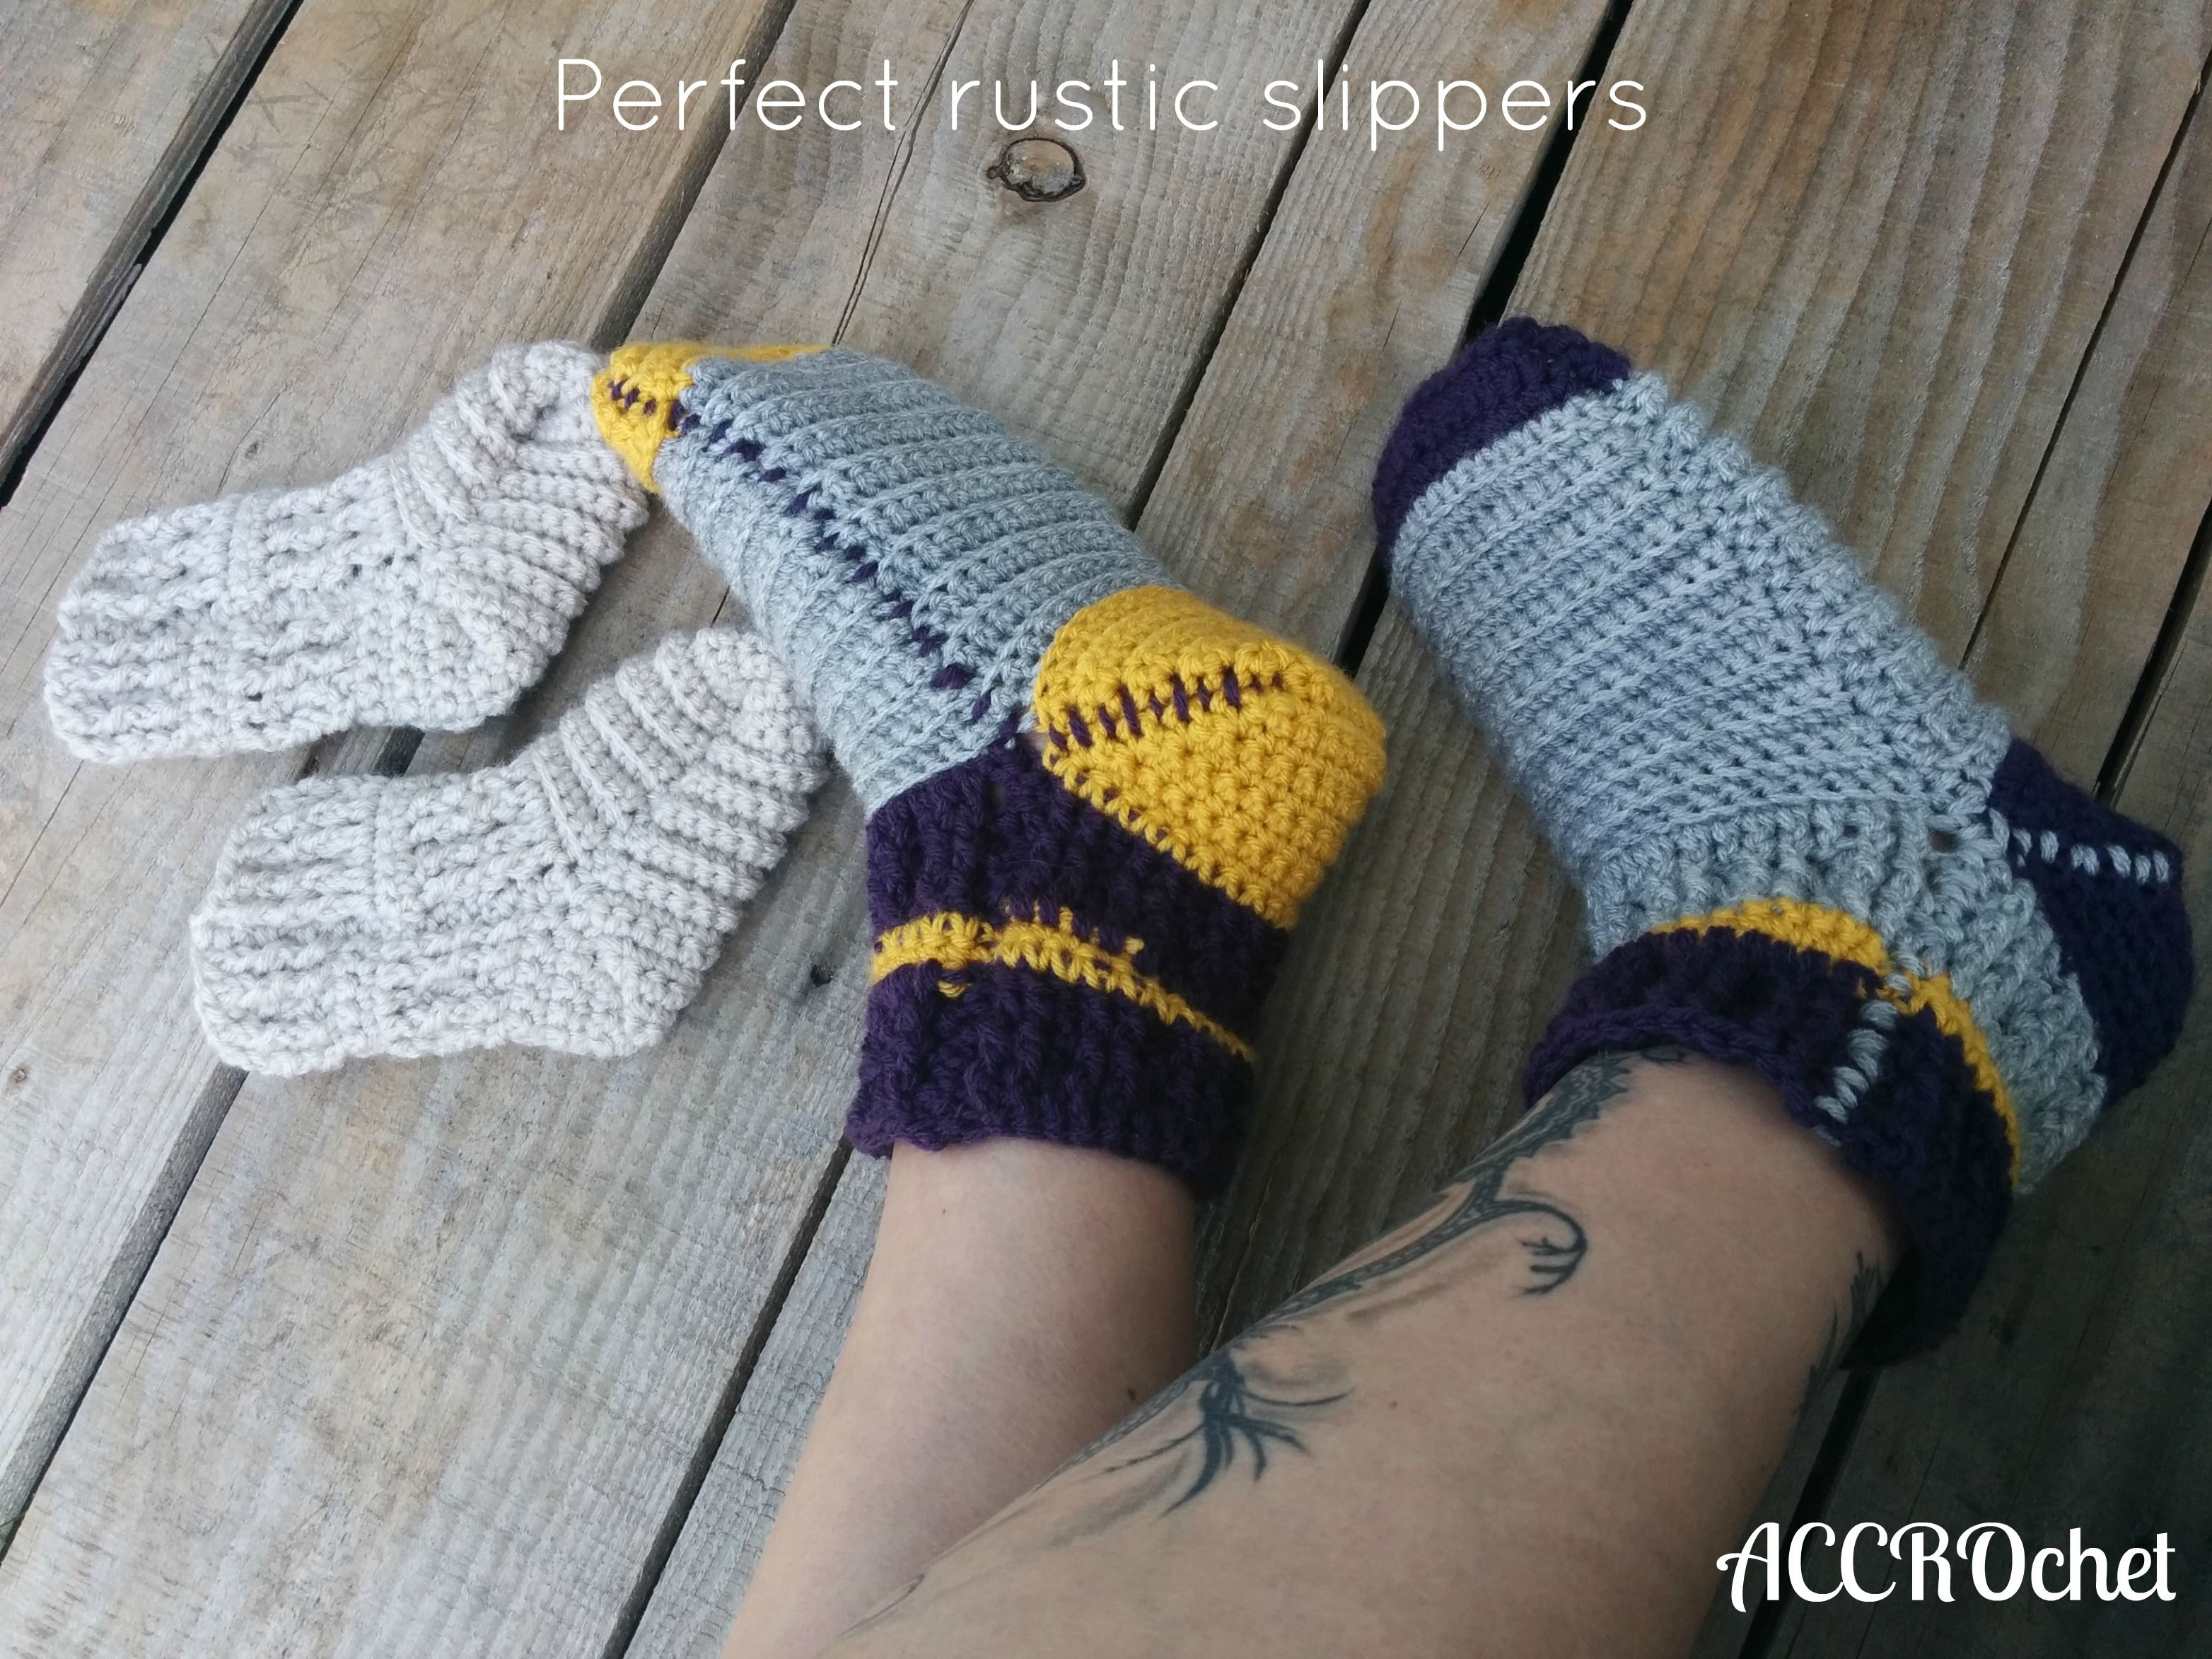 New free crochet pattern perfect rustic slippers accrochet new free crochet pattern perfect rustic slippers accrochet bankloansurffo Images